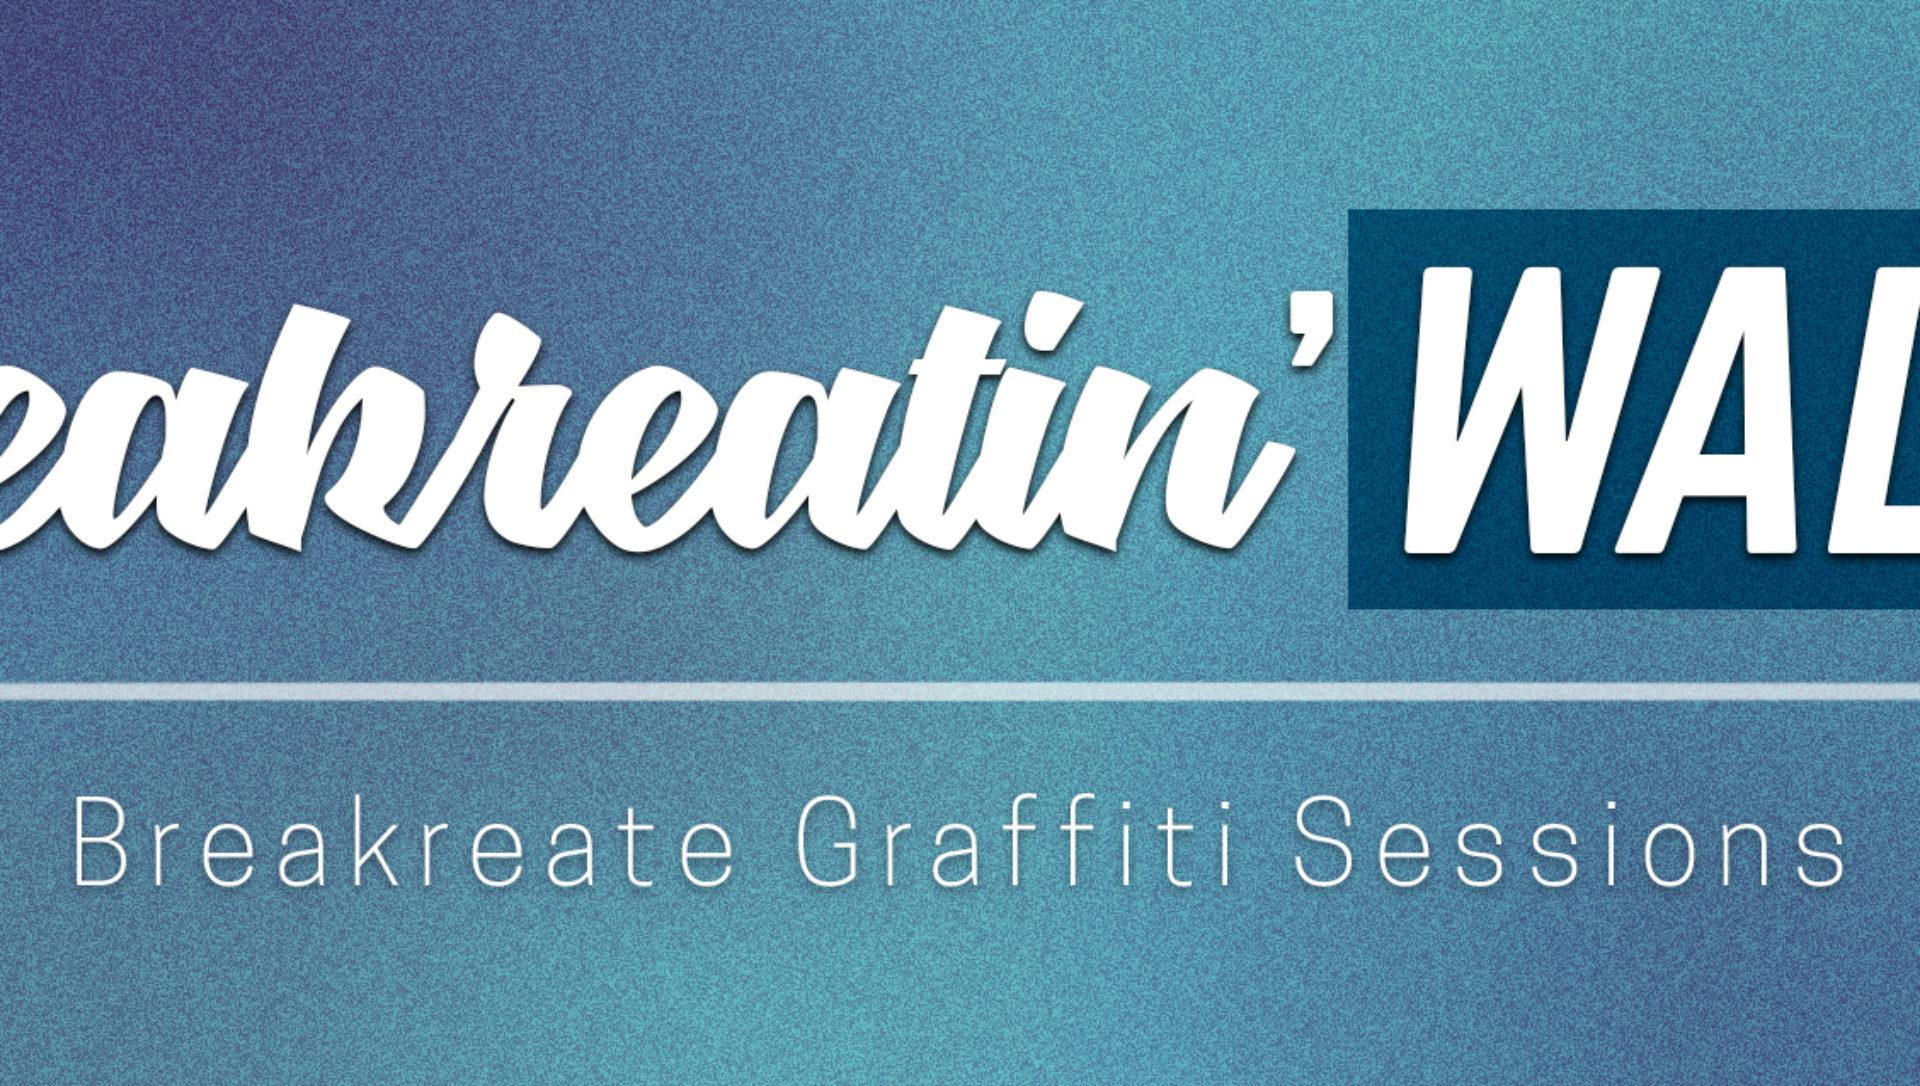 Breakreatin'Walls: Breakreate Graffiti Sessions